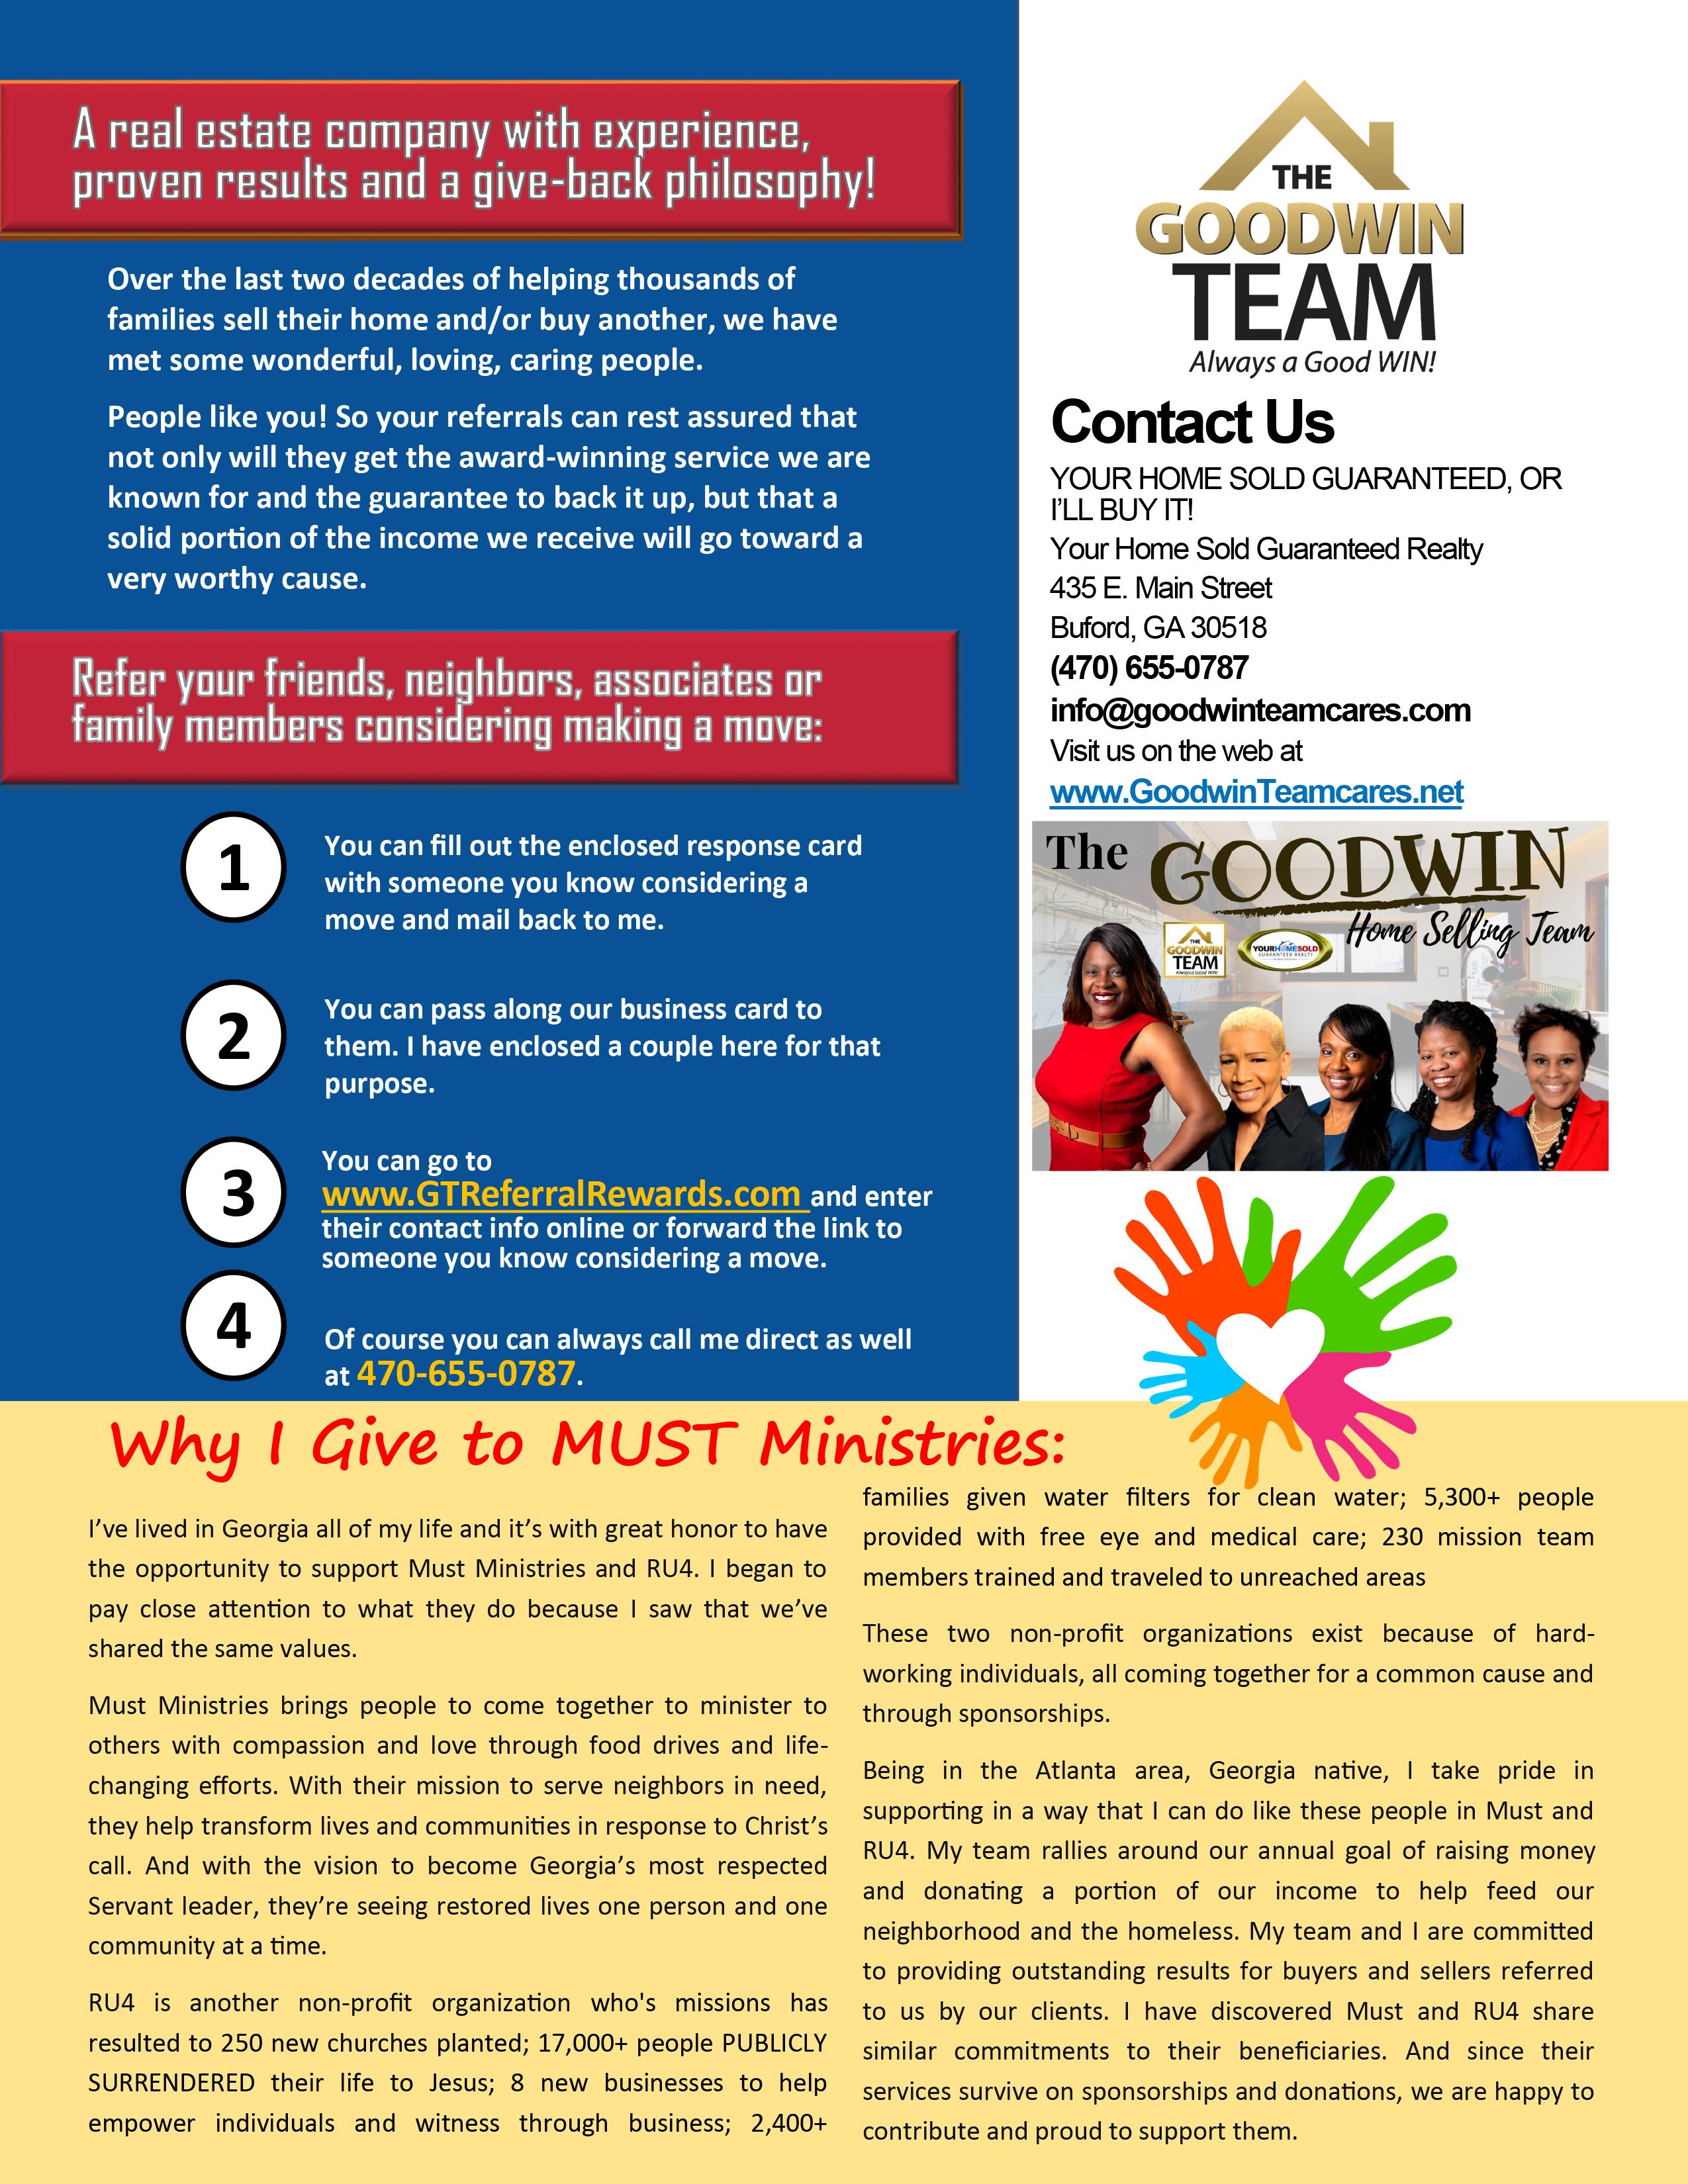 July 2020 Referral Newsletter Goodwin Team-4.JPG